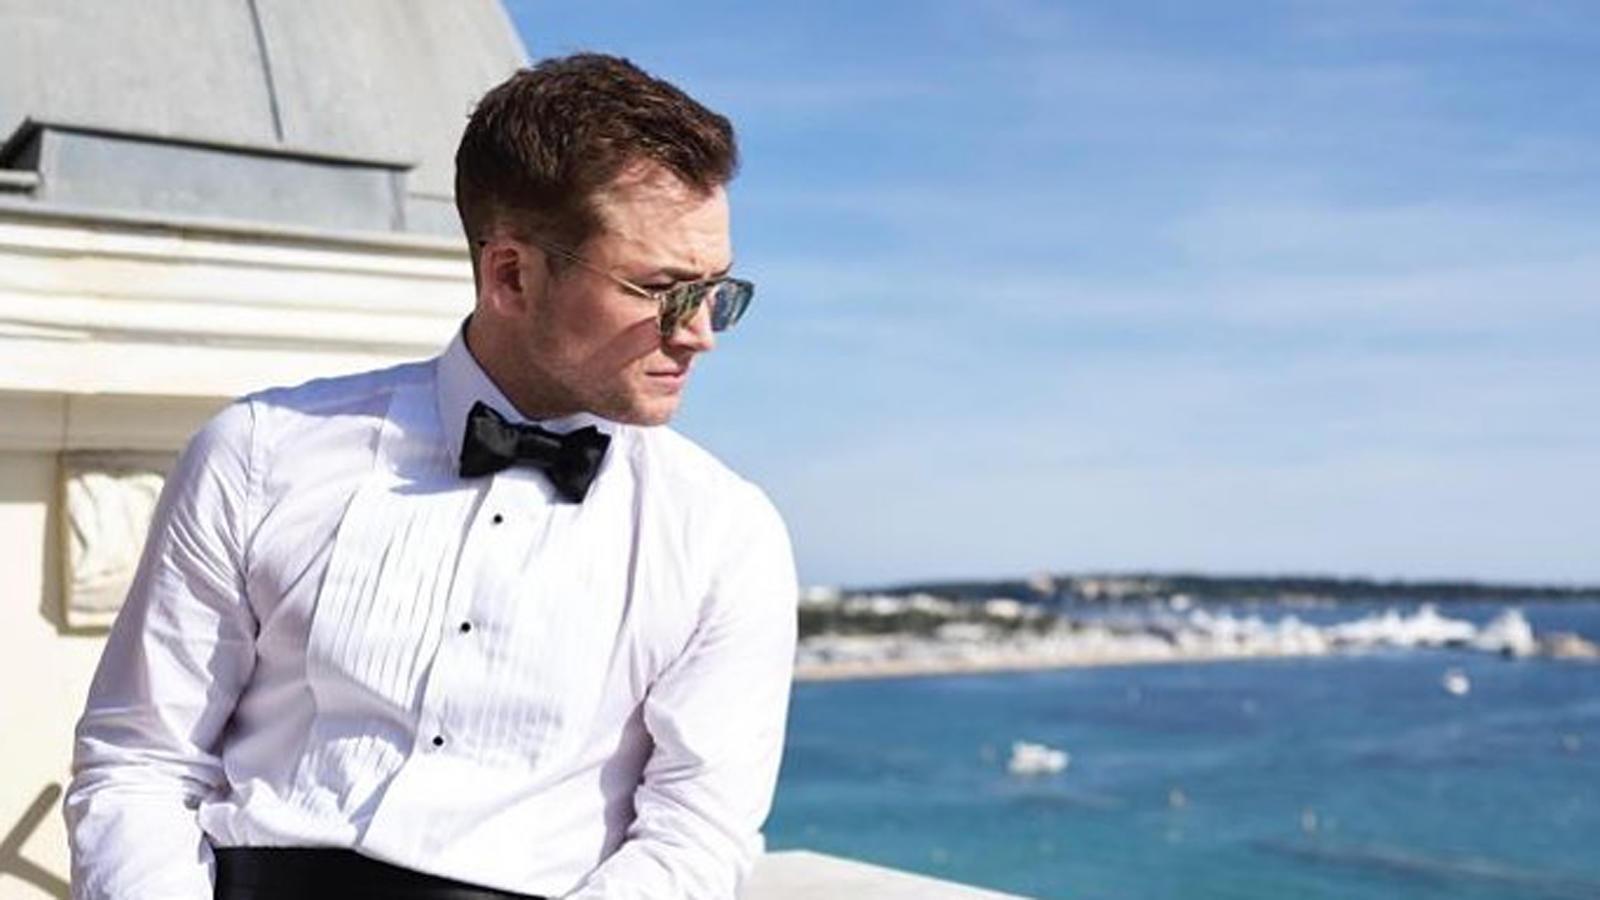 Taron Egerton shares about his transformation process for 'Rocketman'